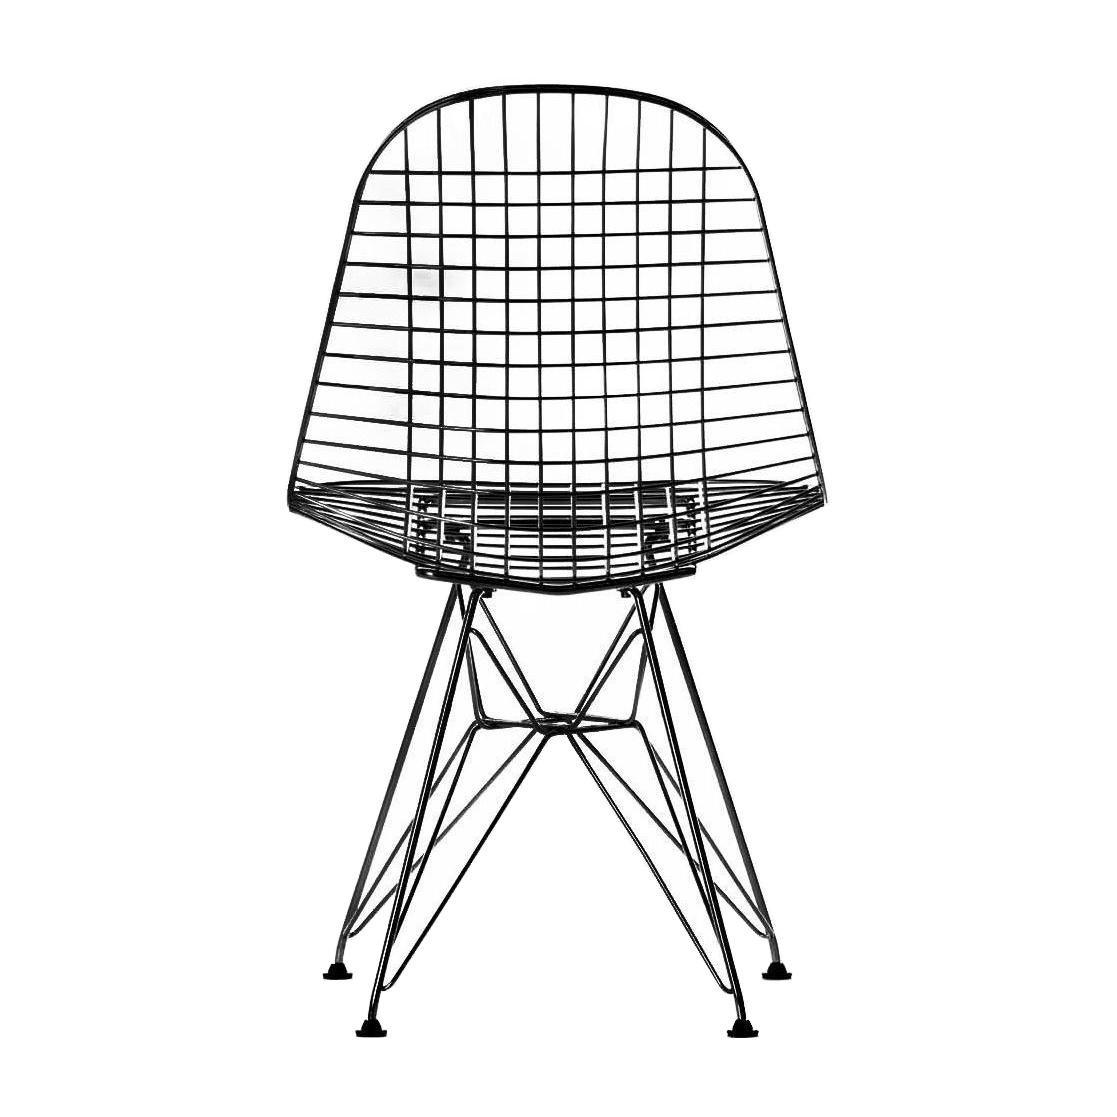 1117x1117 Eames Wire Chair DKR 43cm Vitra